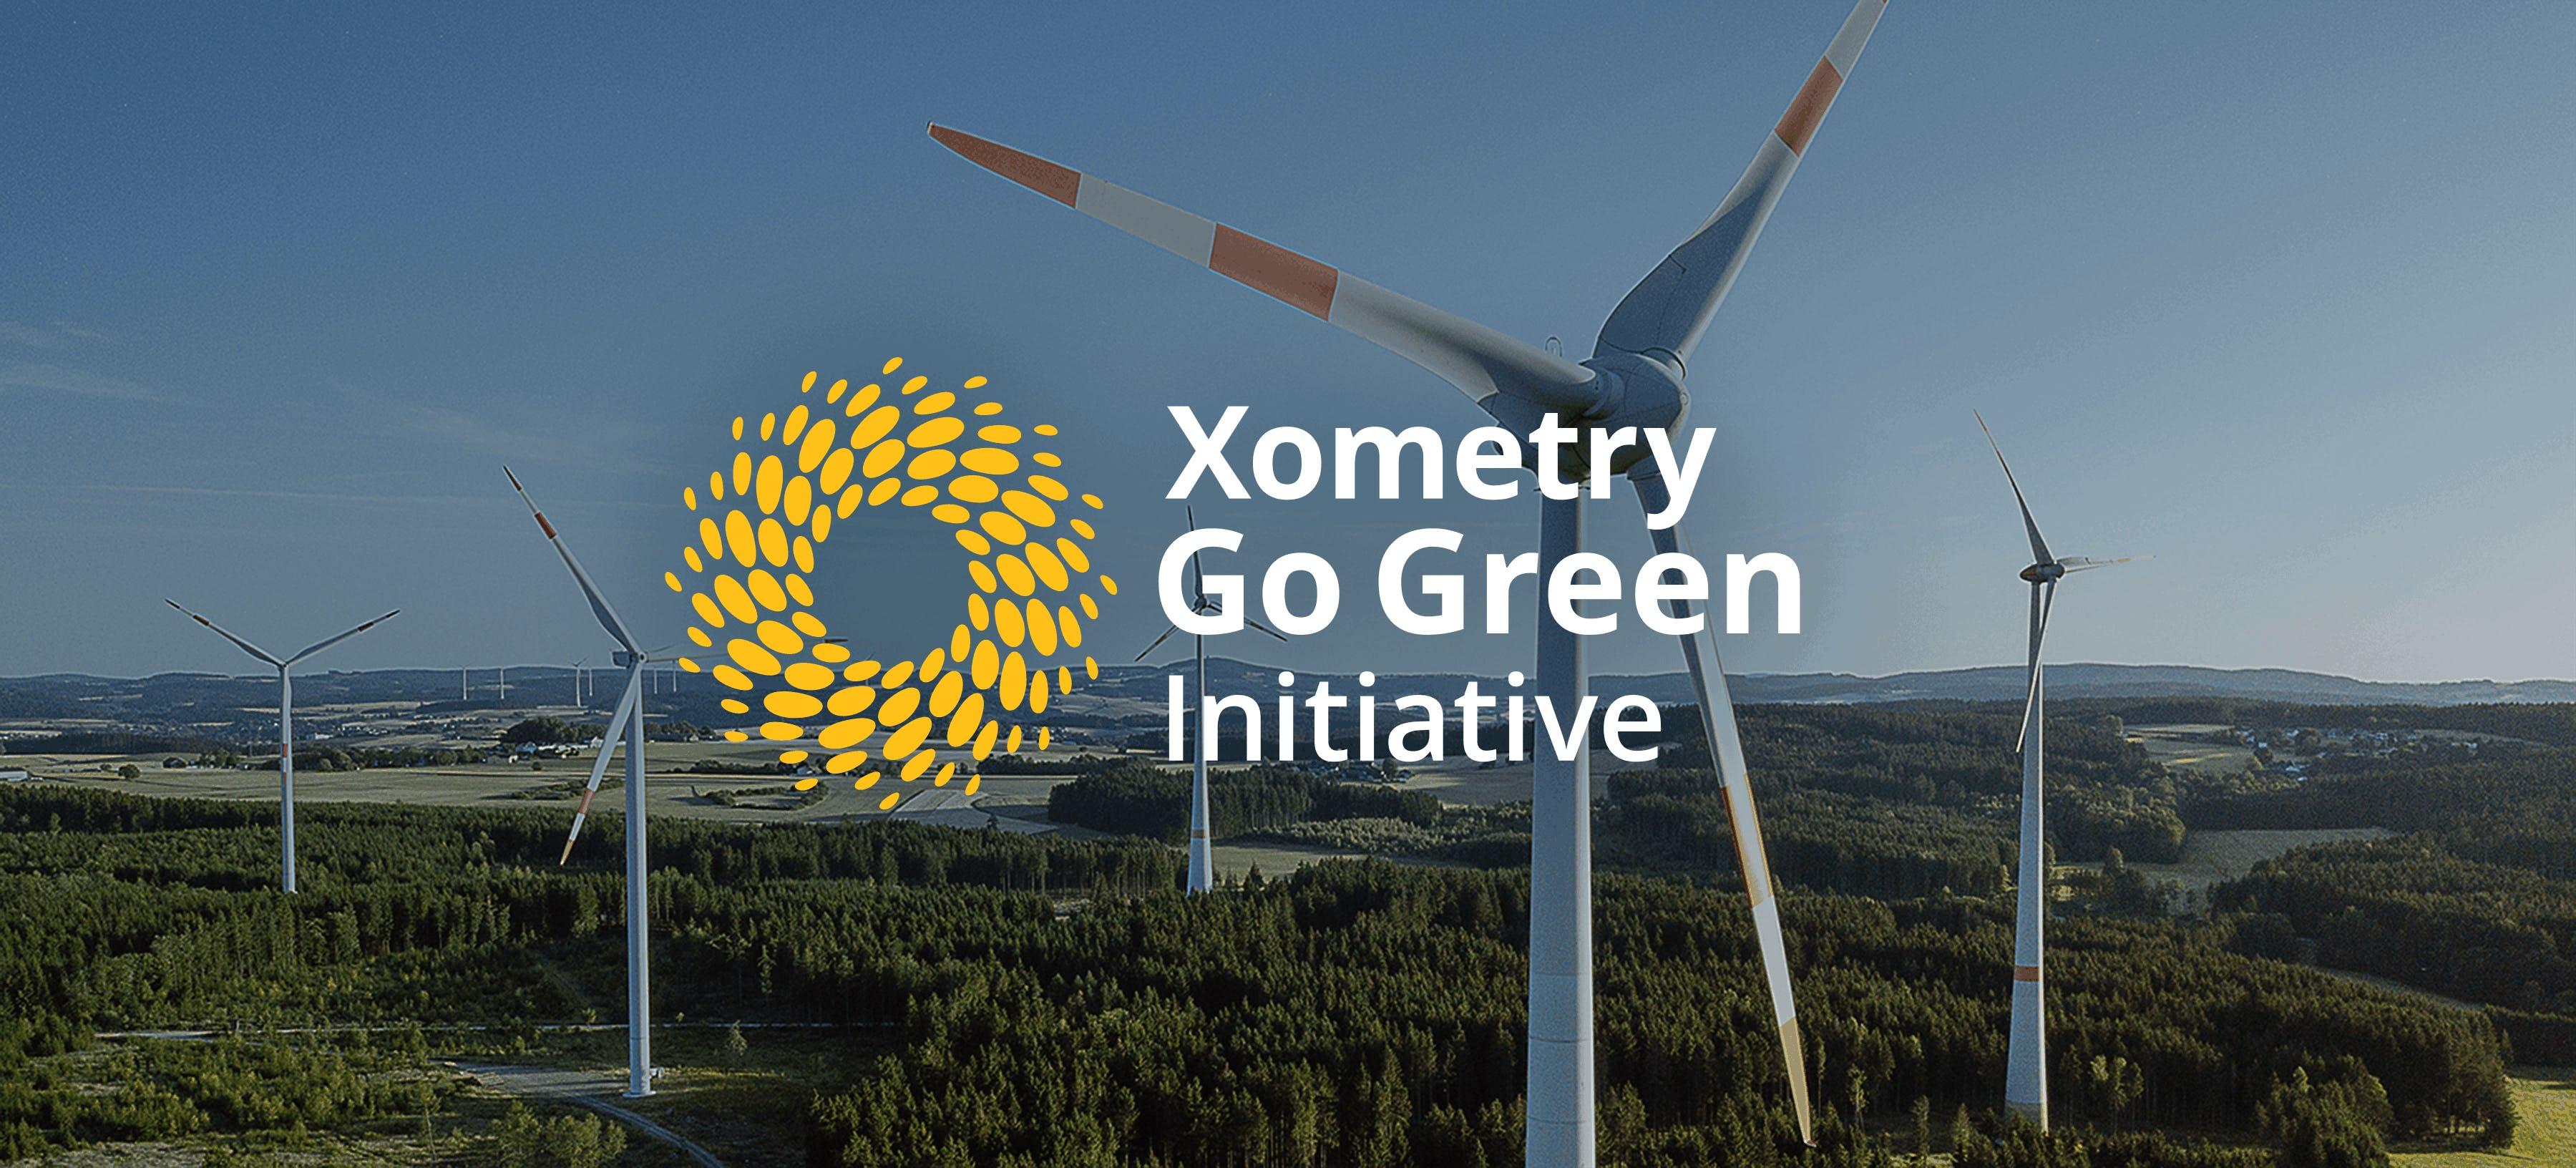 Xometry Go Green windmills